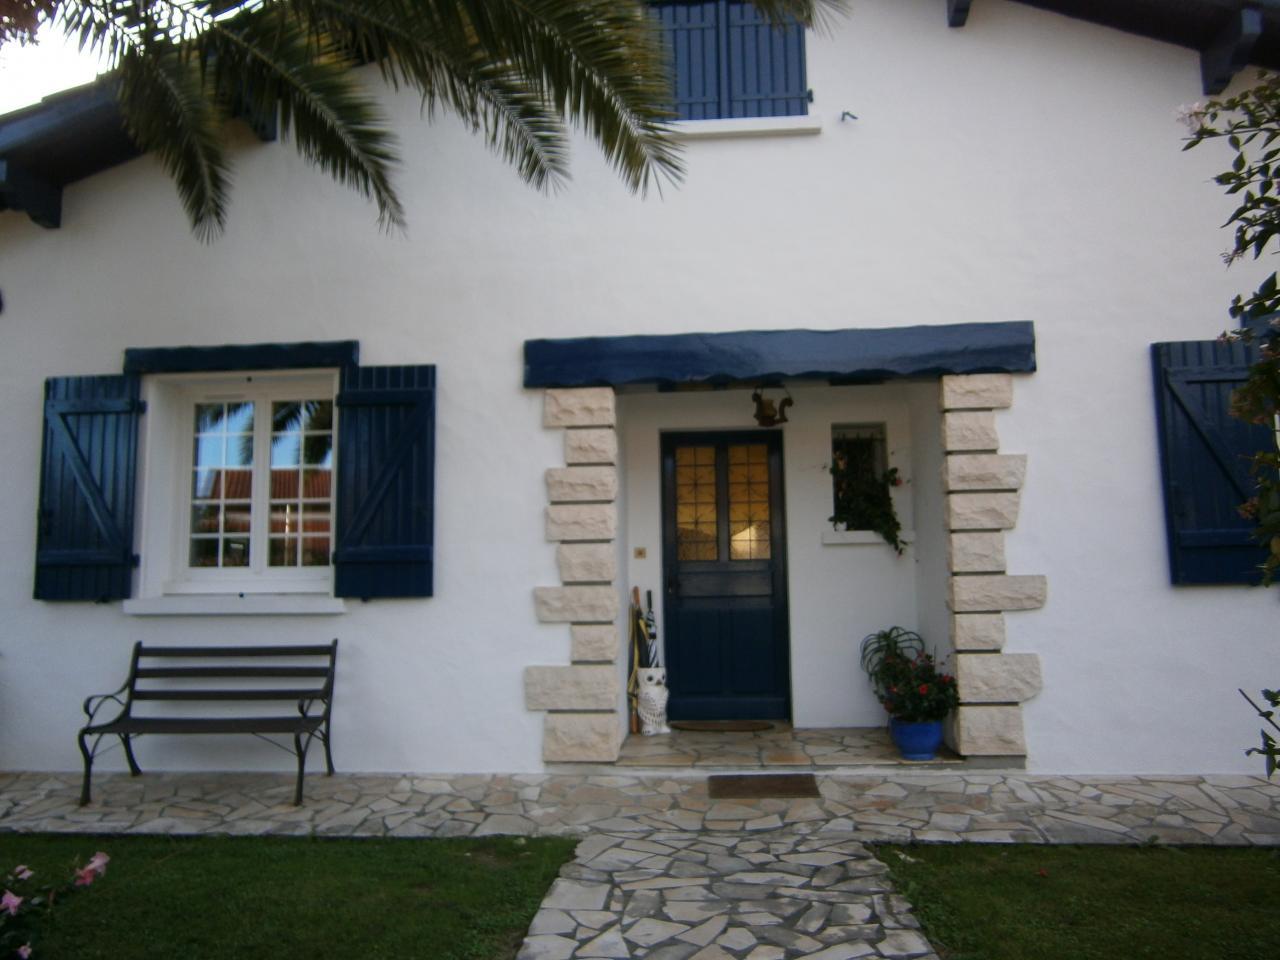 maison bidart bidart location pays basque 64. Black Bedroom Furniture Sets. Home Design Ideas